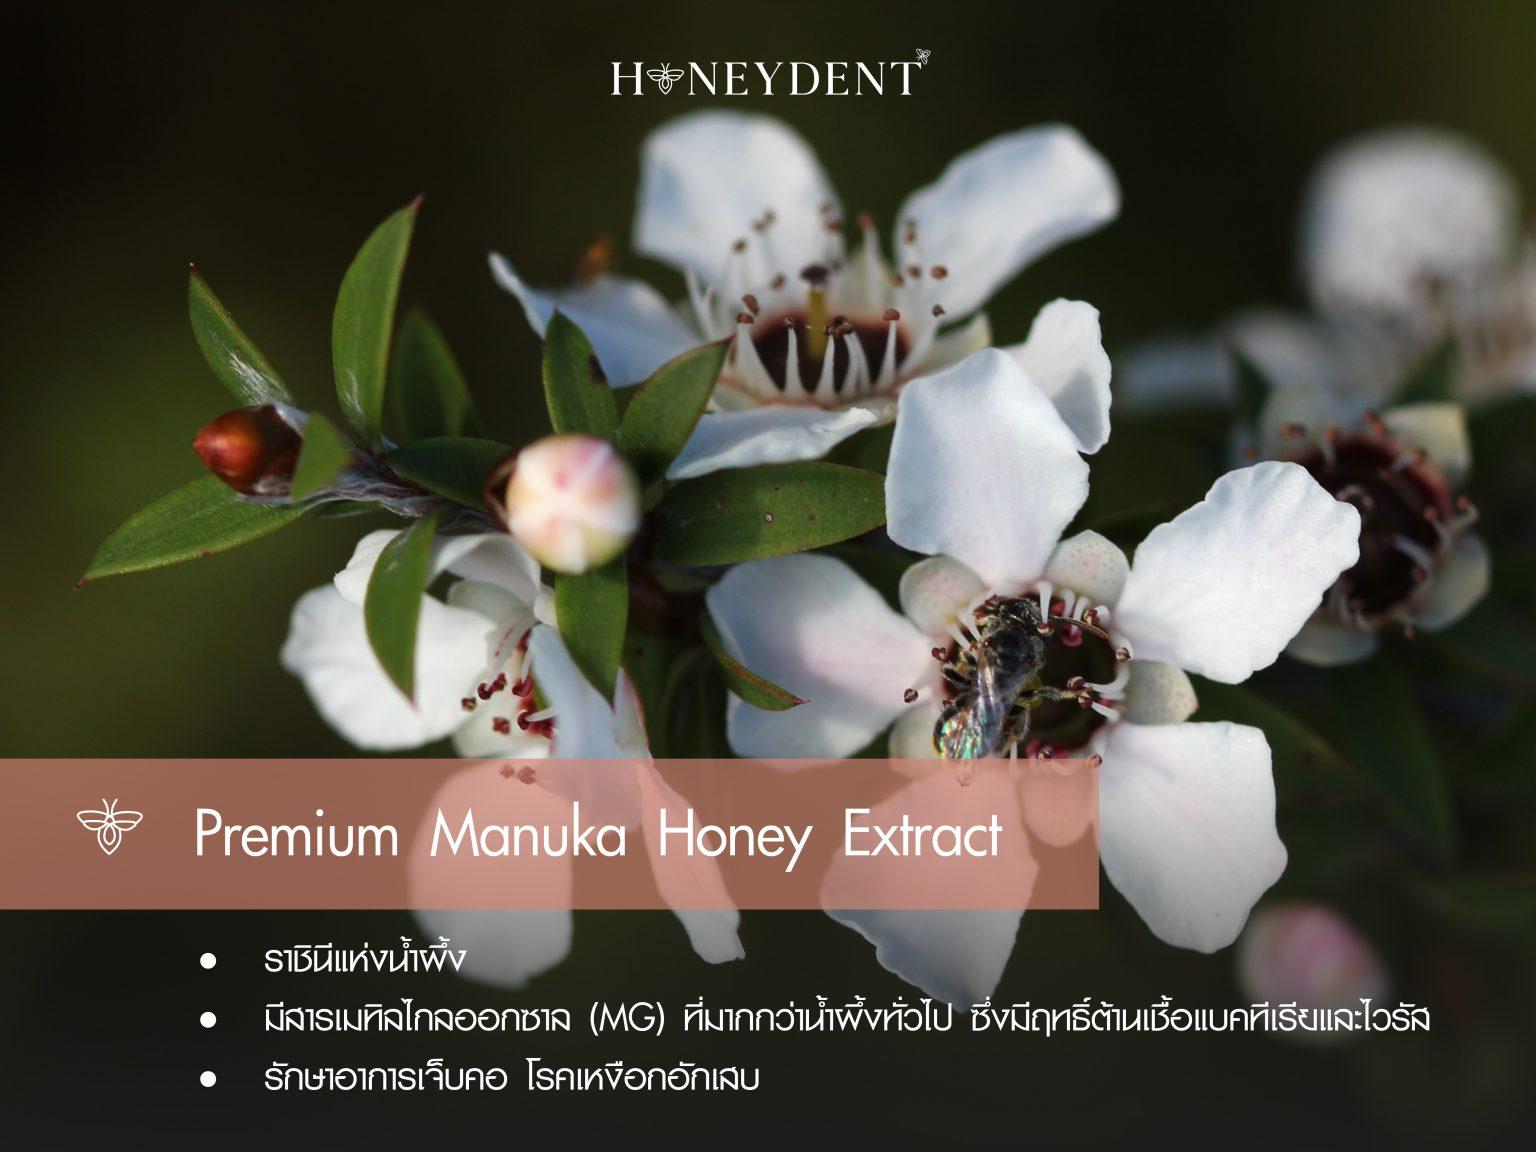 Premium Manuka Honey Extract